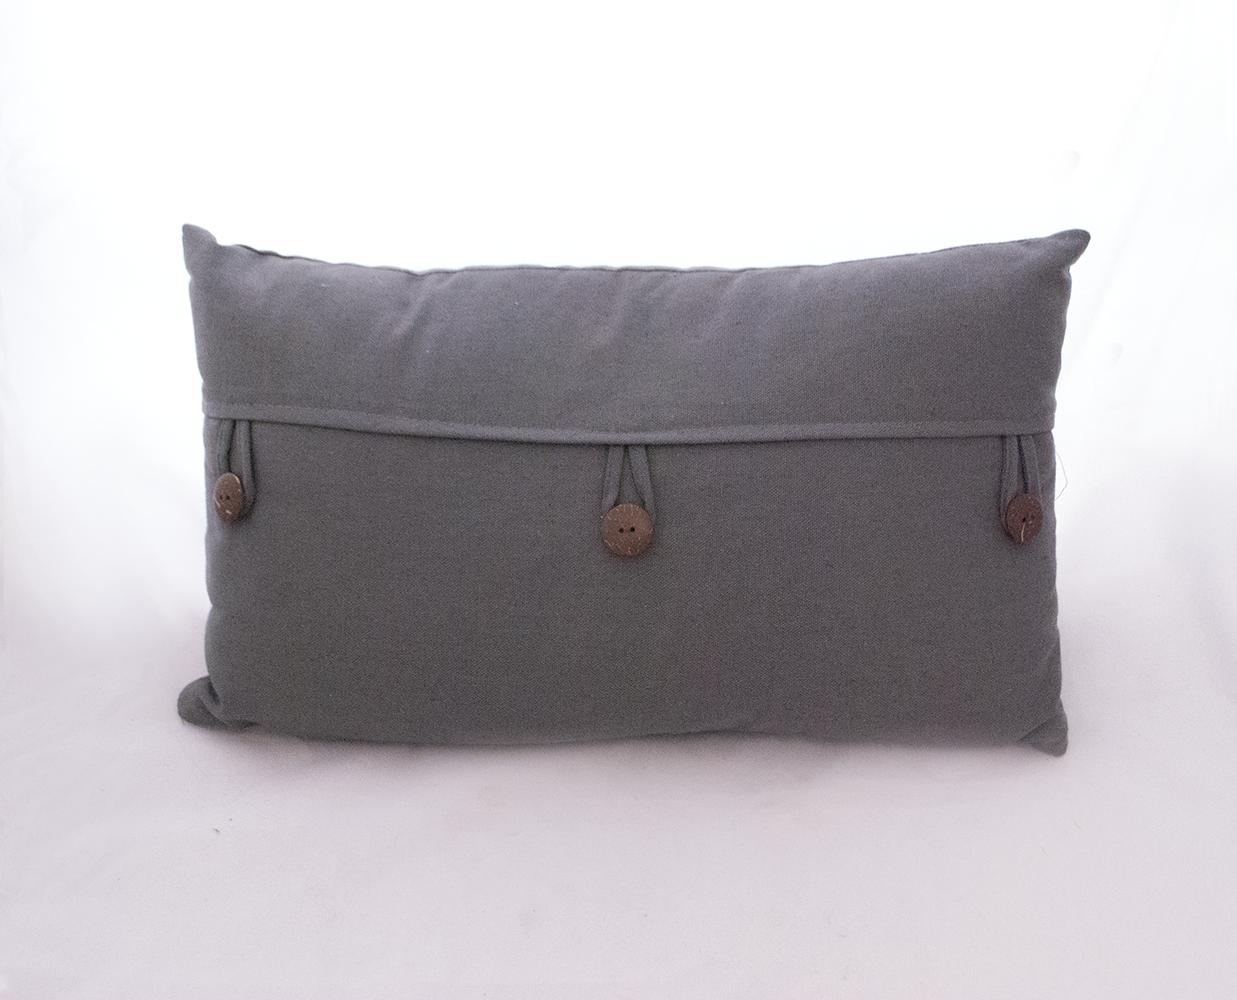 grey button pillow   Quantity: 2  Price: $10.00